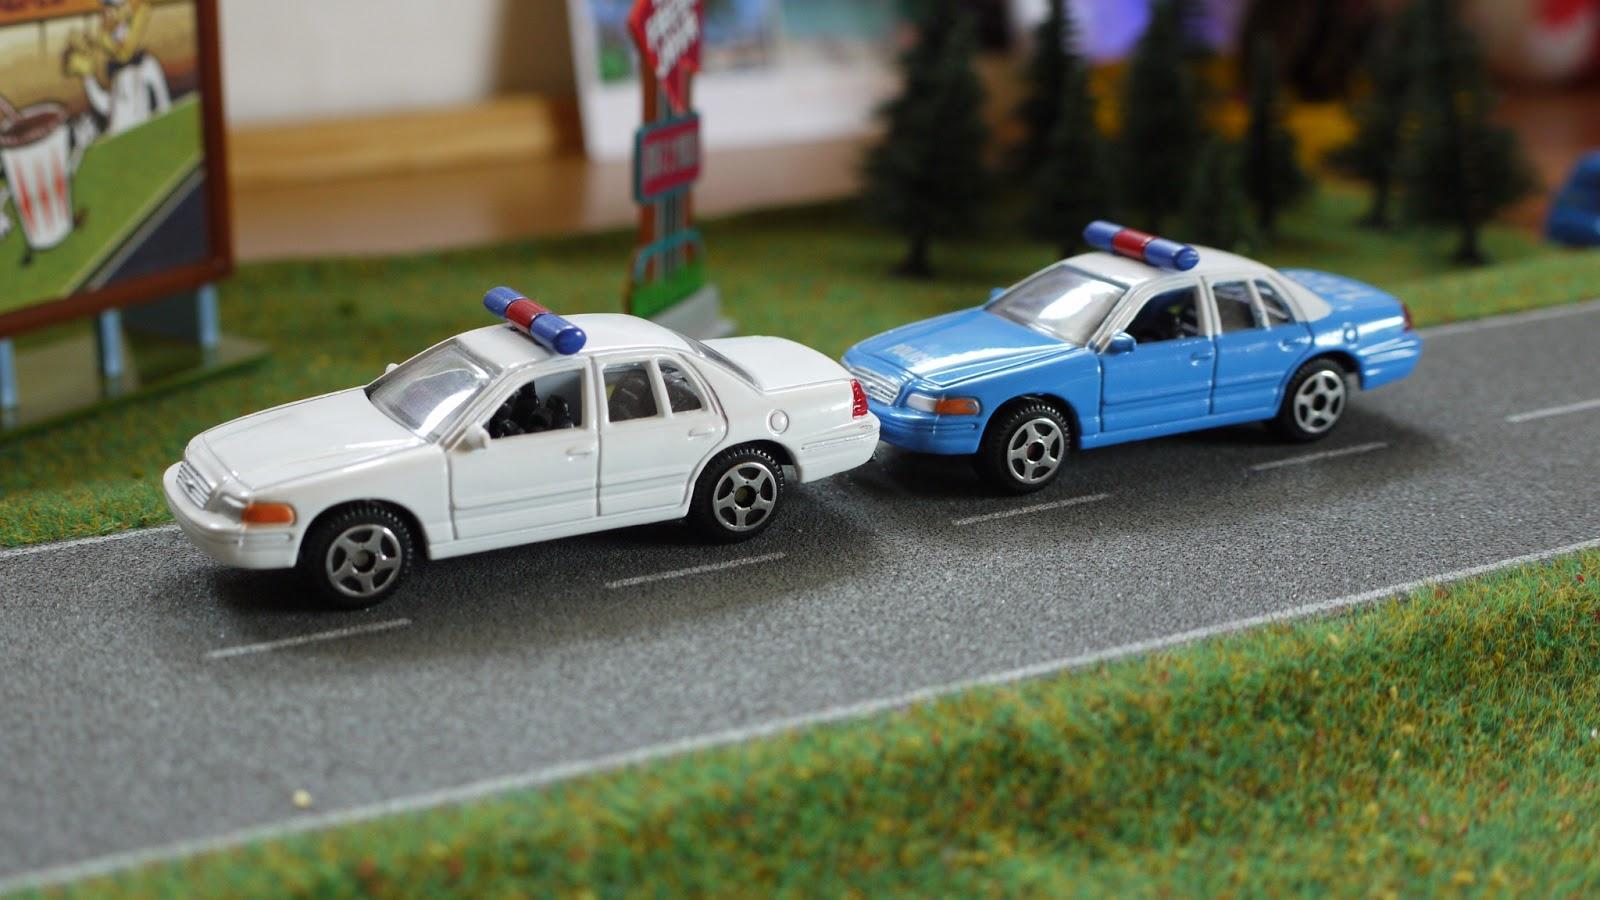 Diecast Cars 1 64 Modellautos 164 Modellbilar 1970 Ford Police Car